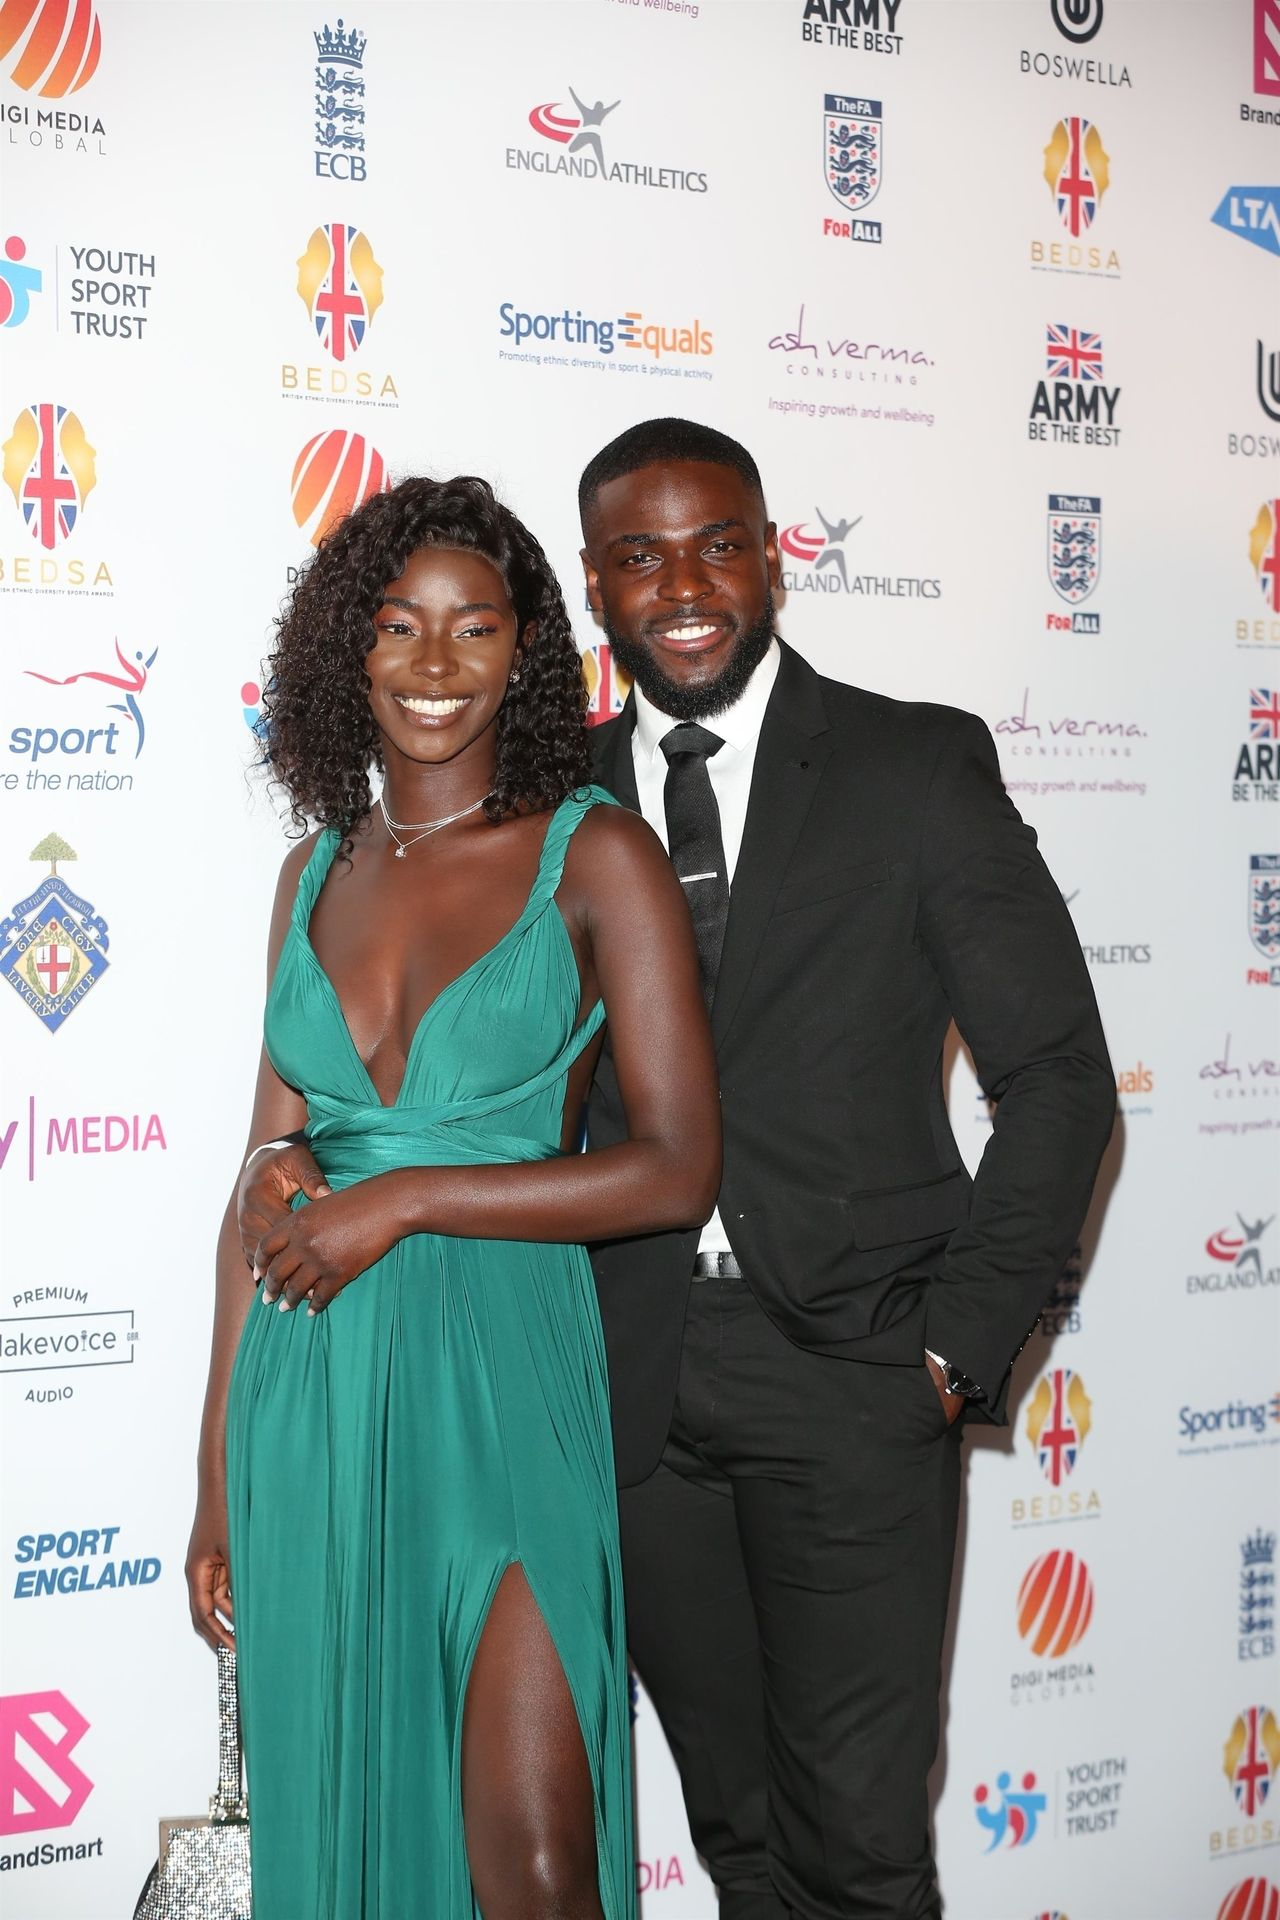 Mike Boateng & Priscilla Anyabu Are Seen At British Ethnic Diversity Sports Awards 0036